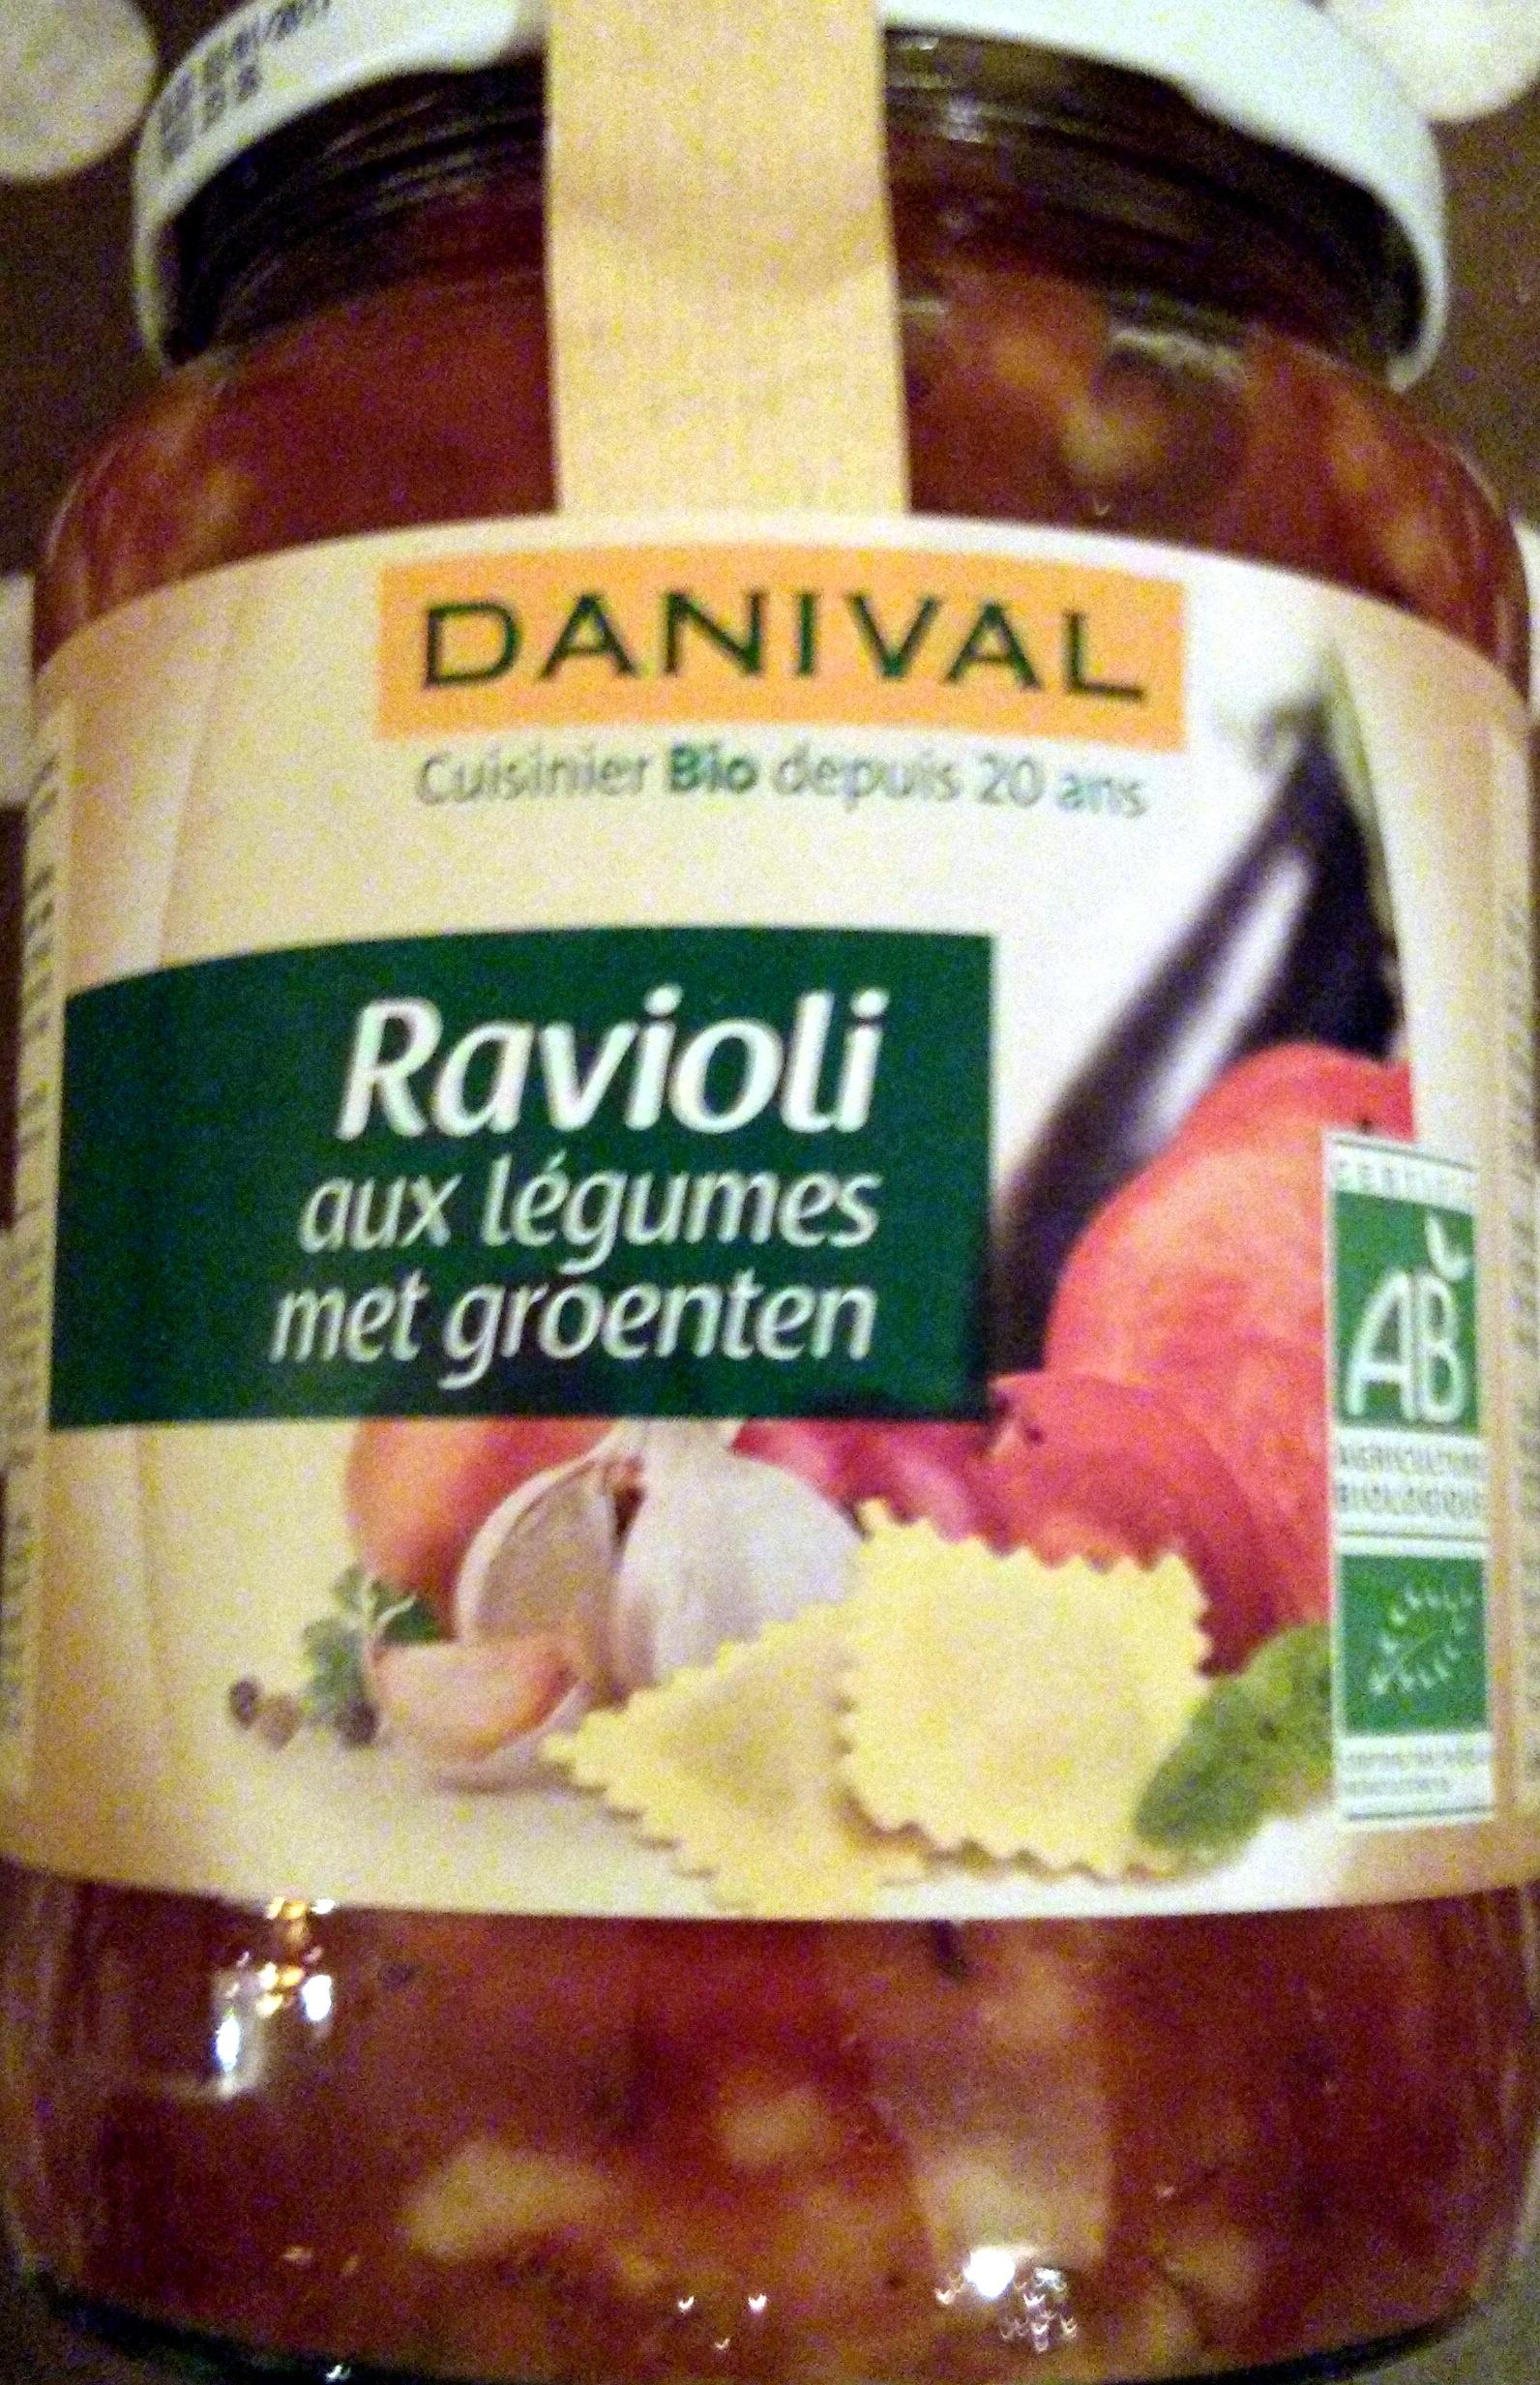 Ravioli 5 légumes - Produit - fr